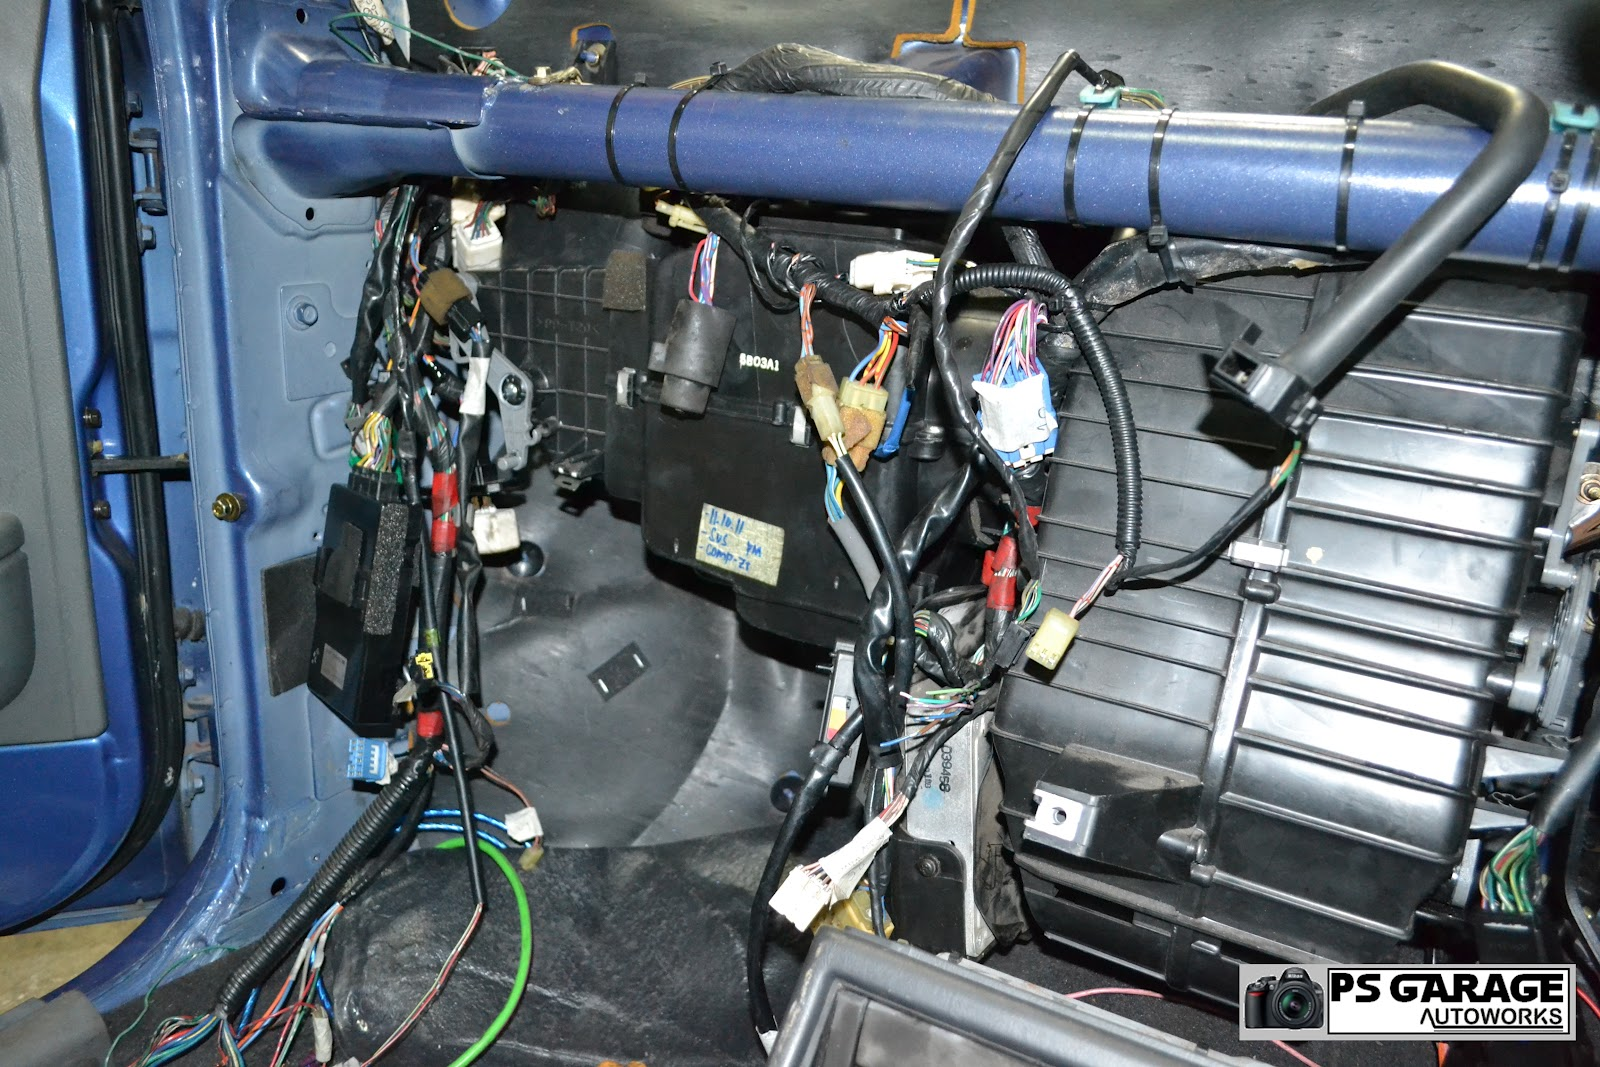 Ps Garage Motorsport  Hyundai Atos Starlet Gt  Part